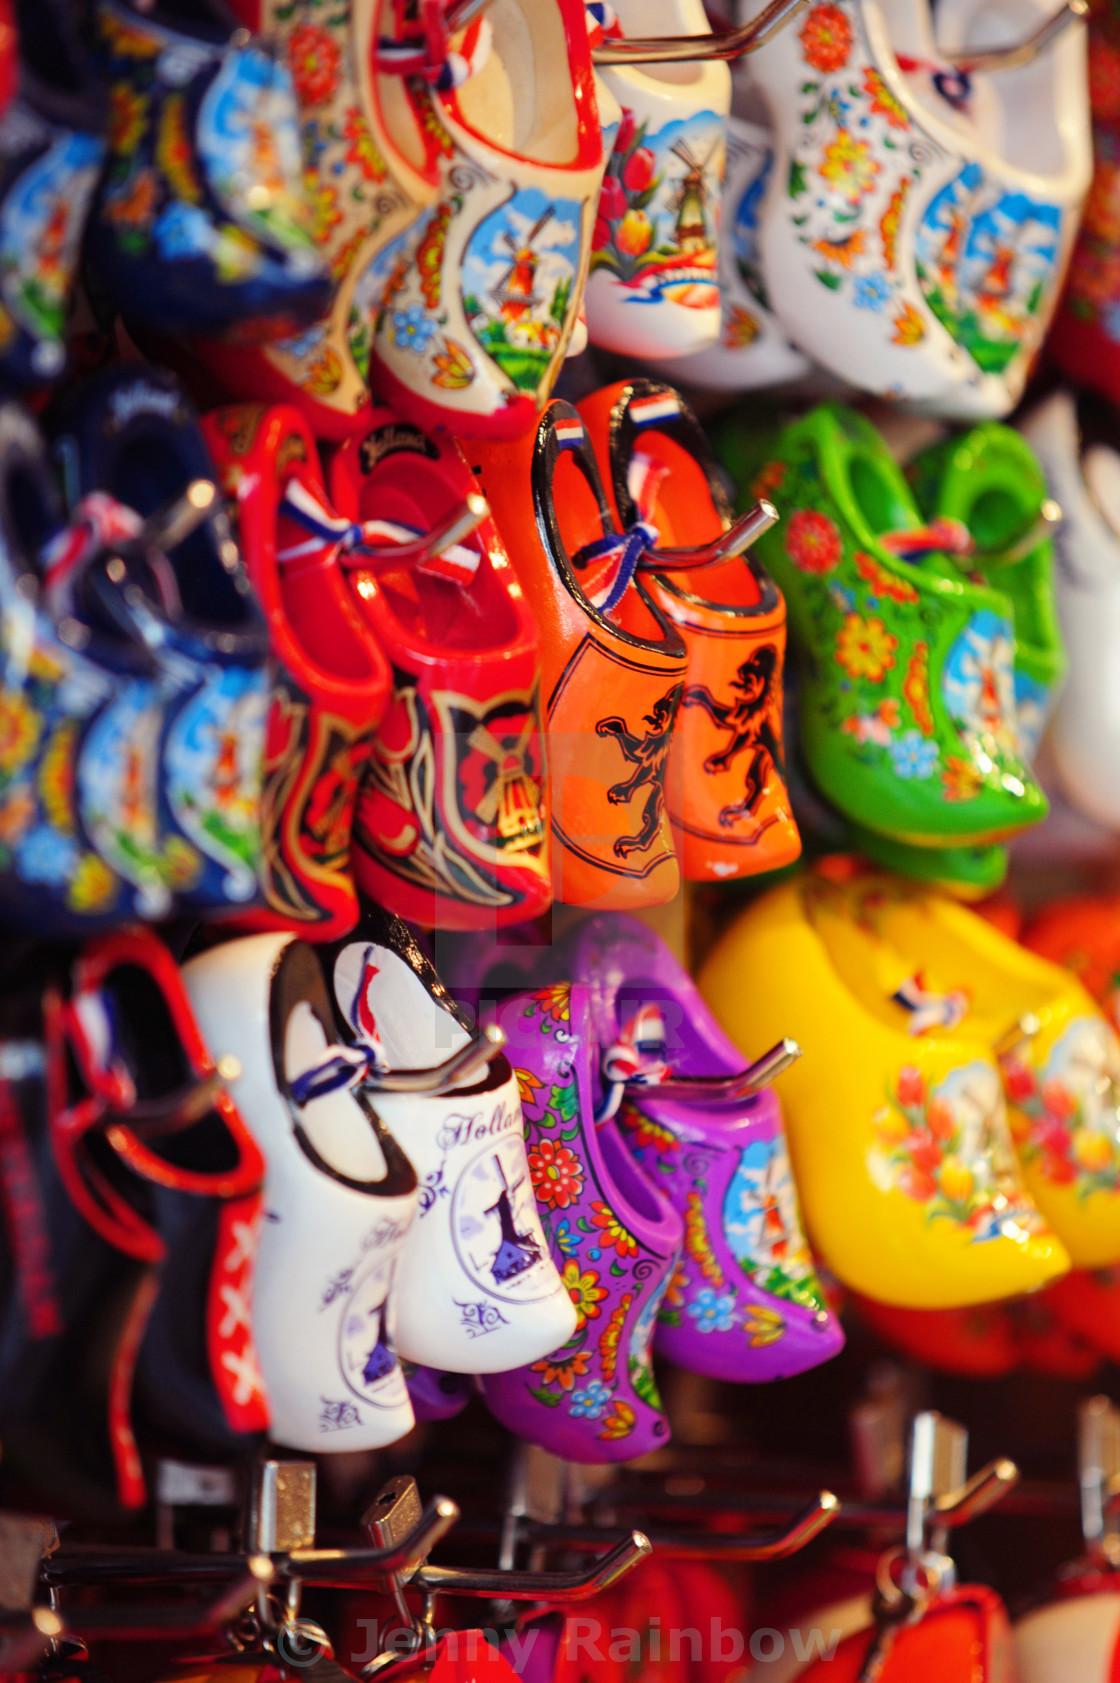 Souvenir Shop Display With Colorful Dutch Wooden Shoes License